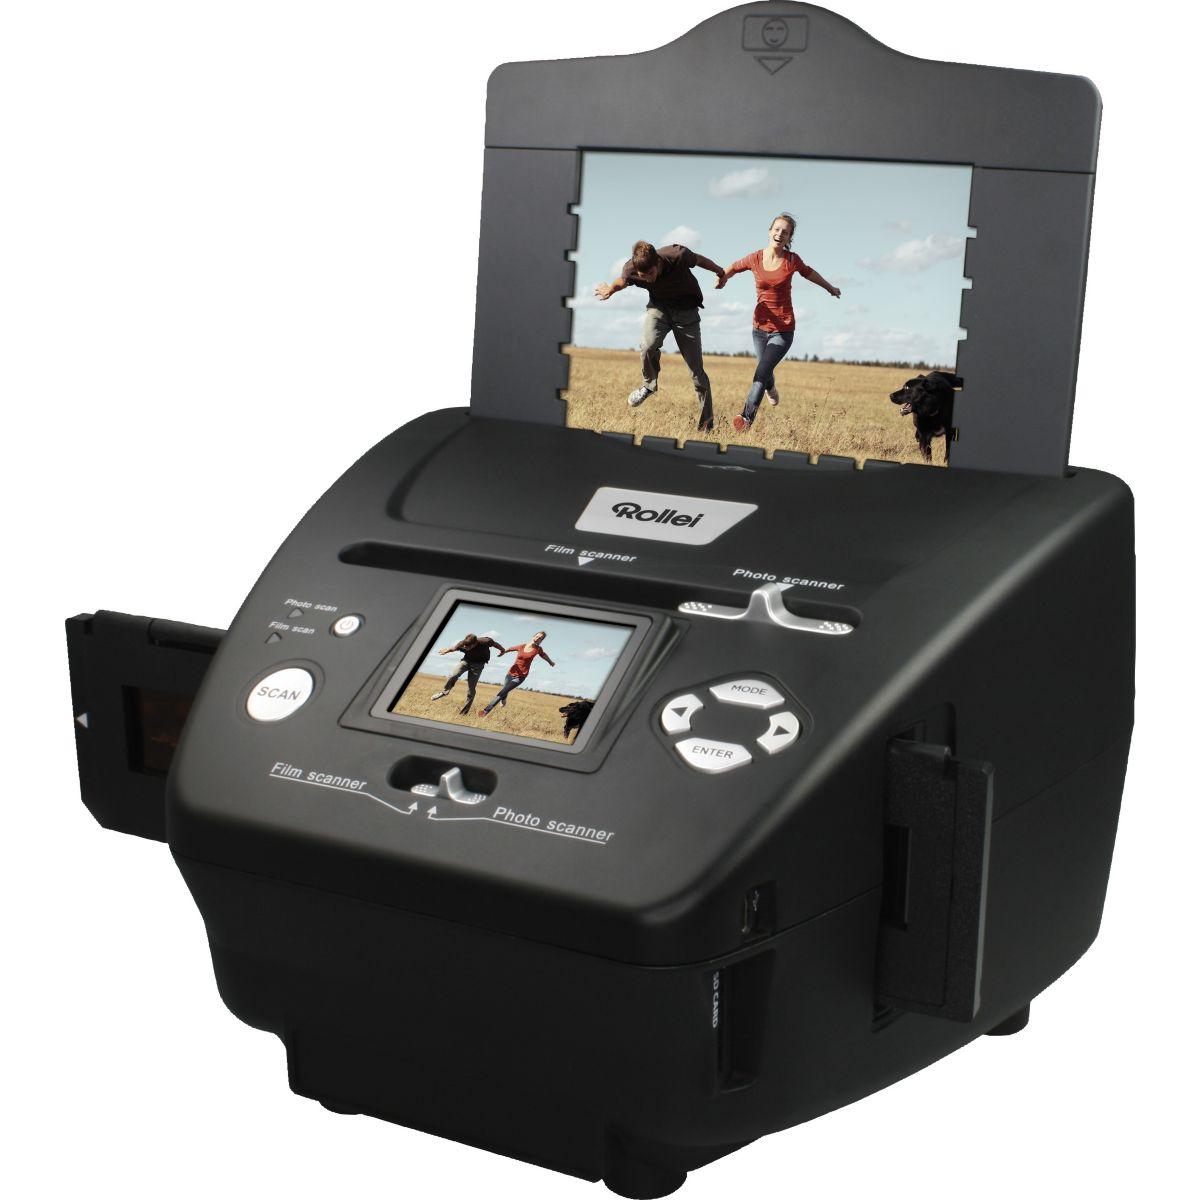 Scanner portable rollei pdf s240 se (photo)